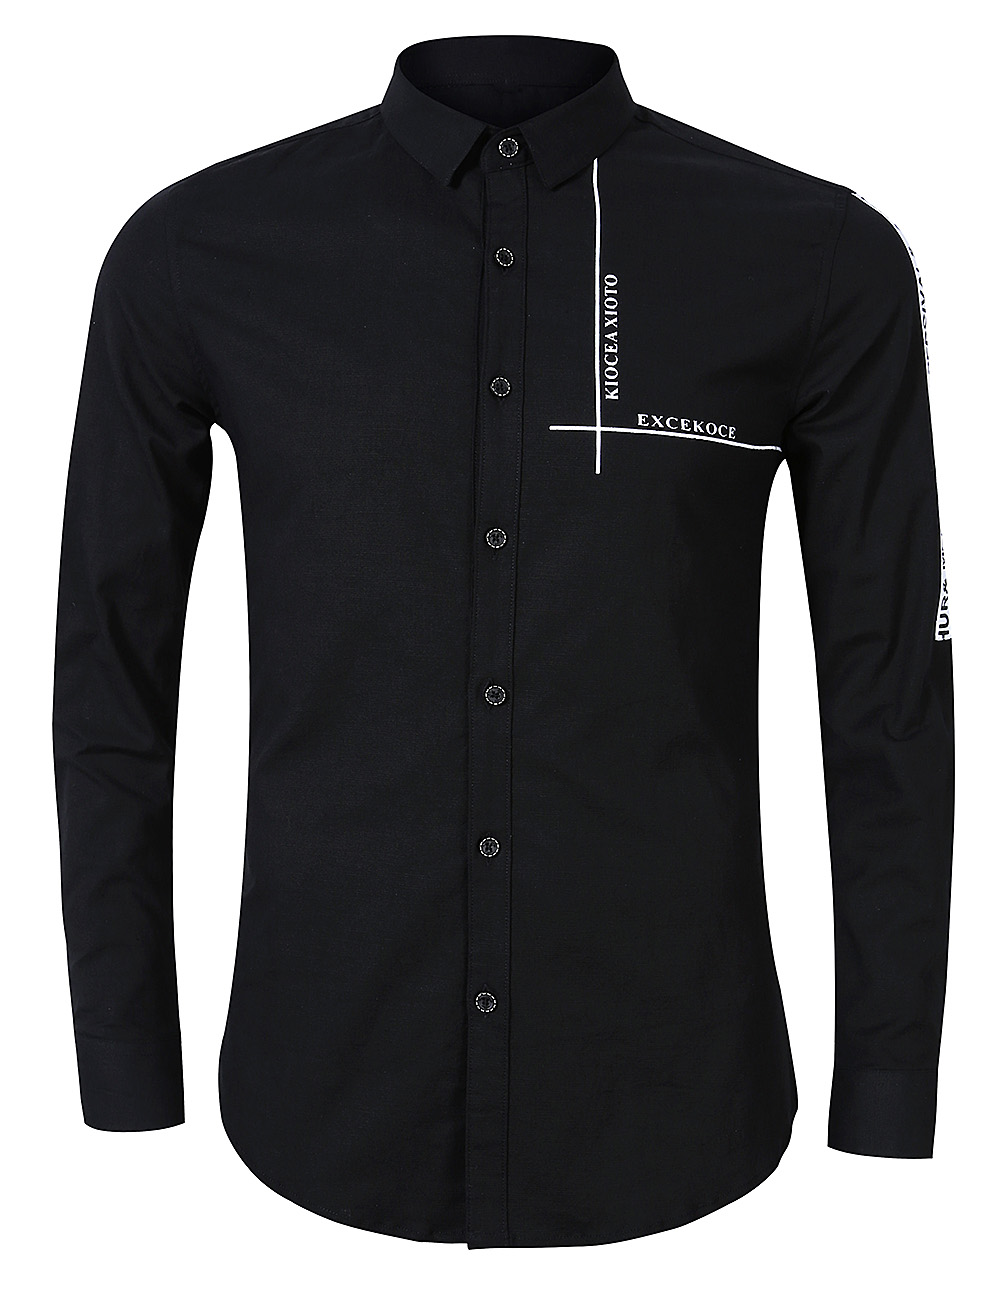 a4155f2b8146 Redcolourful - Yong Horse Men s Causal Fashion Print Long Sleeve Shirt  White Color black Size M - Walmart.com